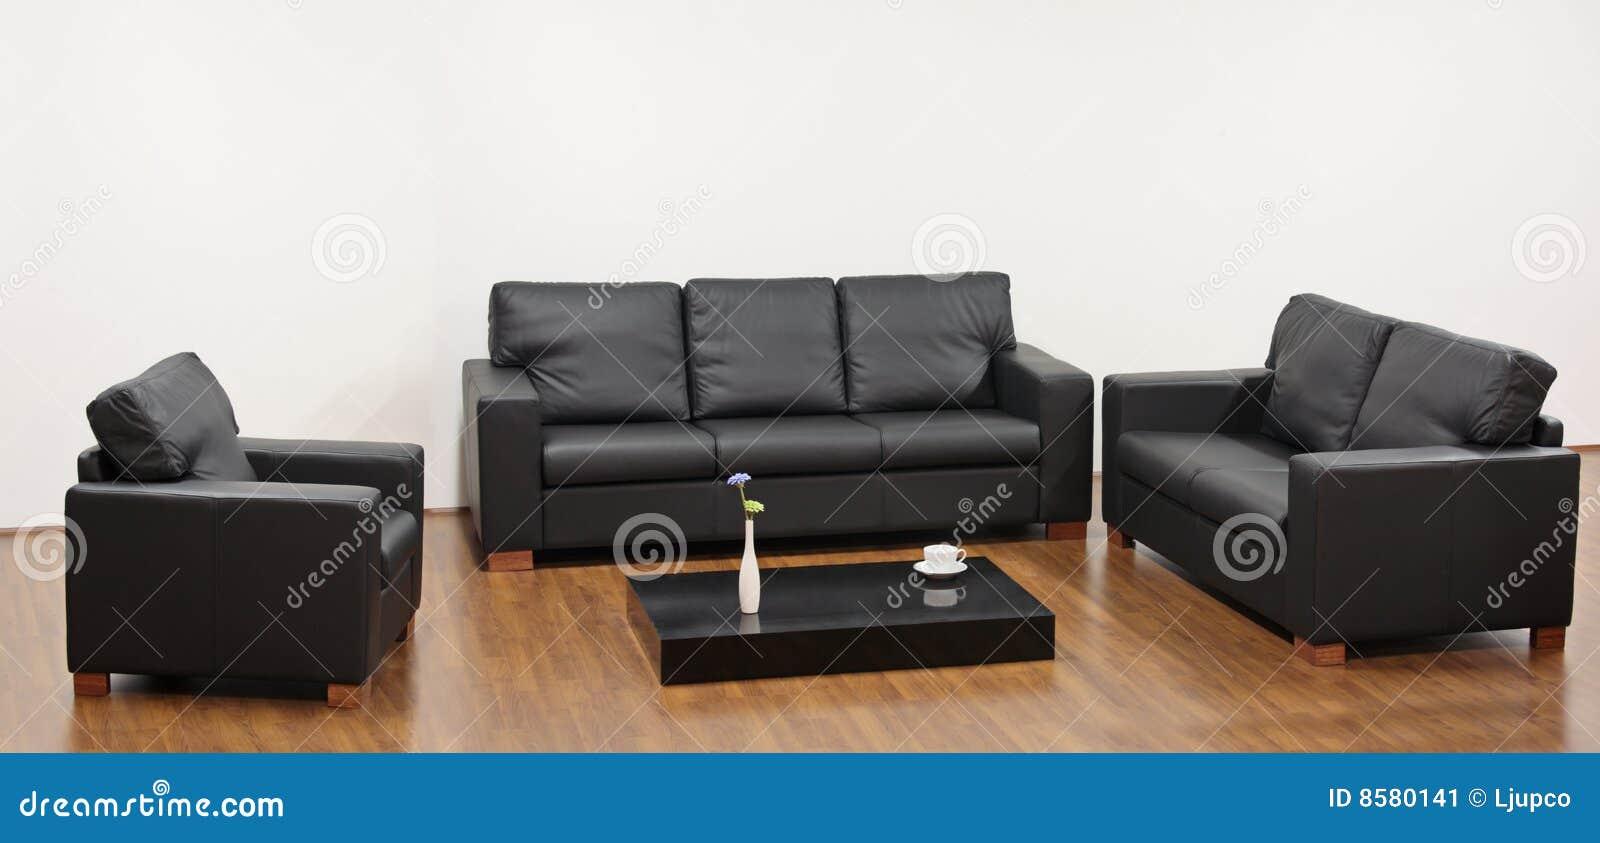 A Modern Minimalist Living Room Stock Image Image Of Floor Flat  # Waiting Muebles